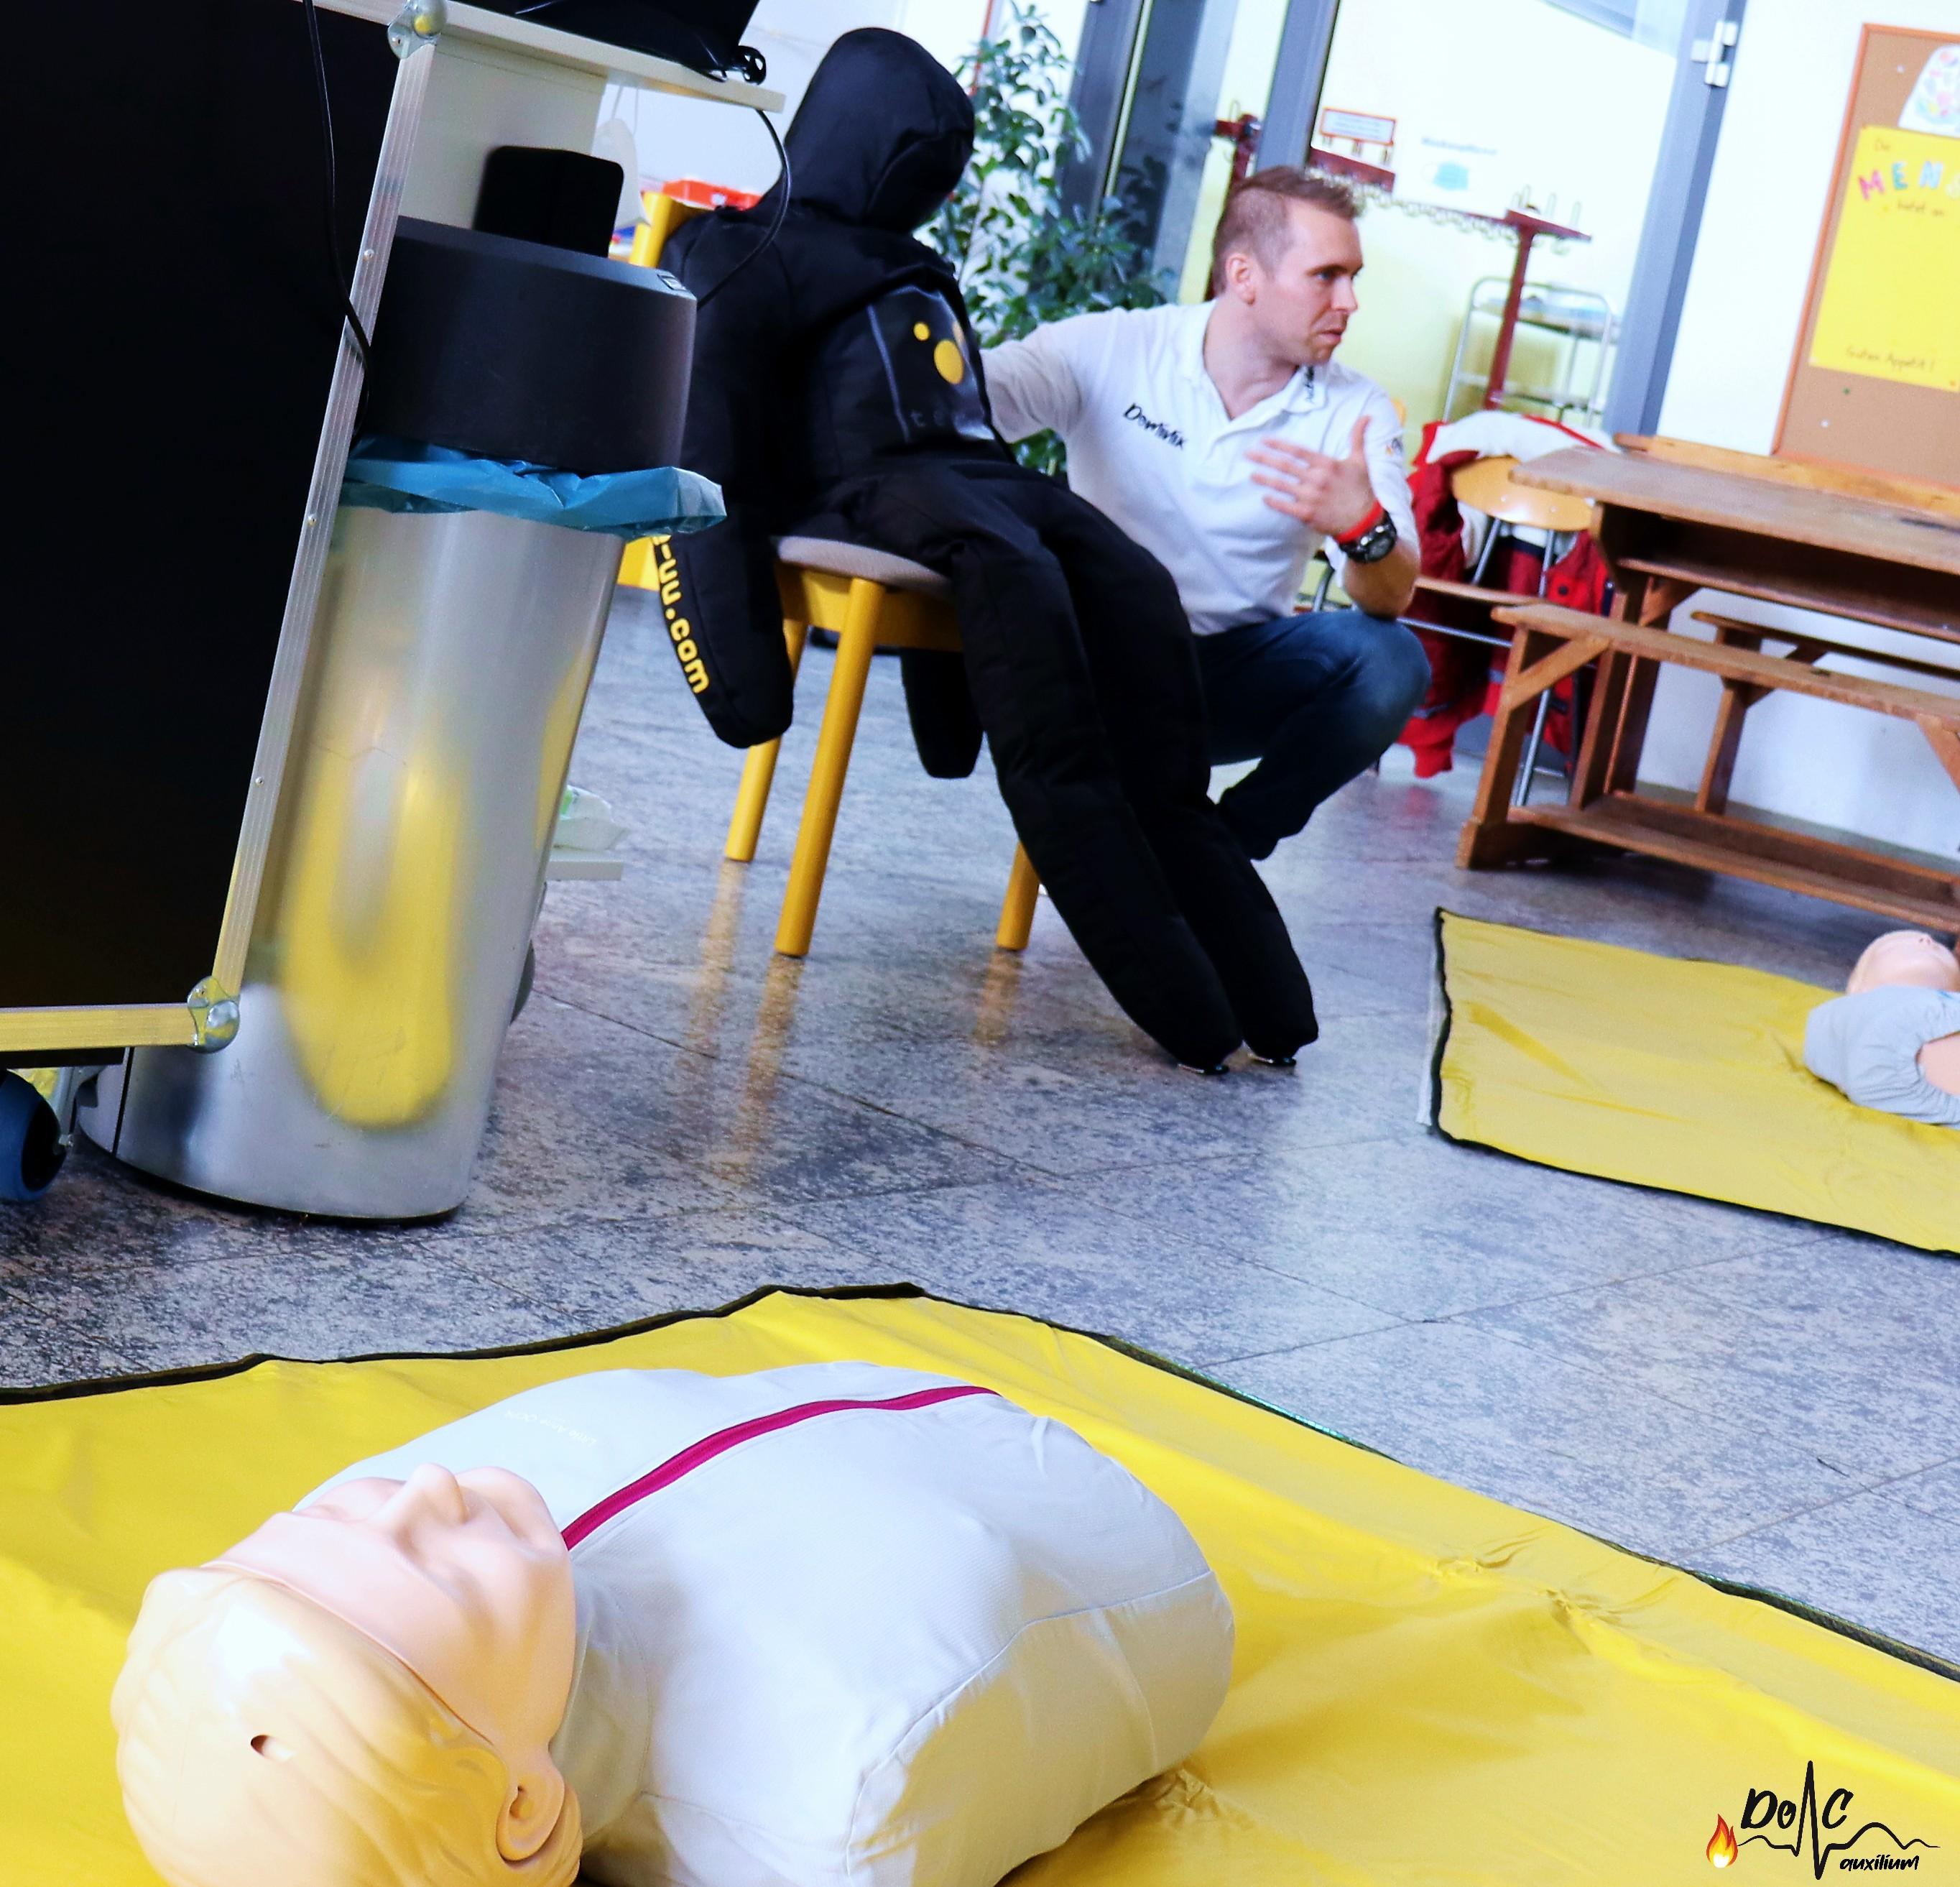 Rettungsgriff Erste-Hilfe